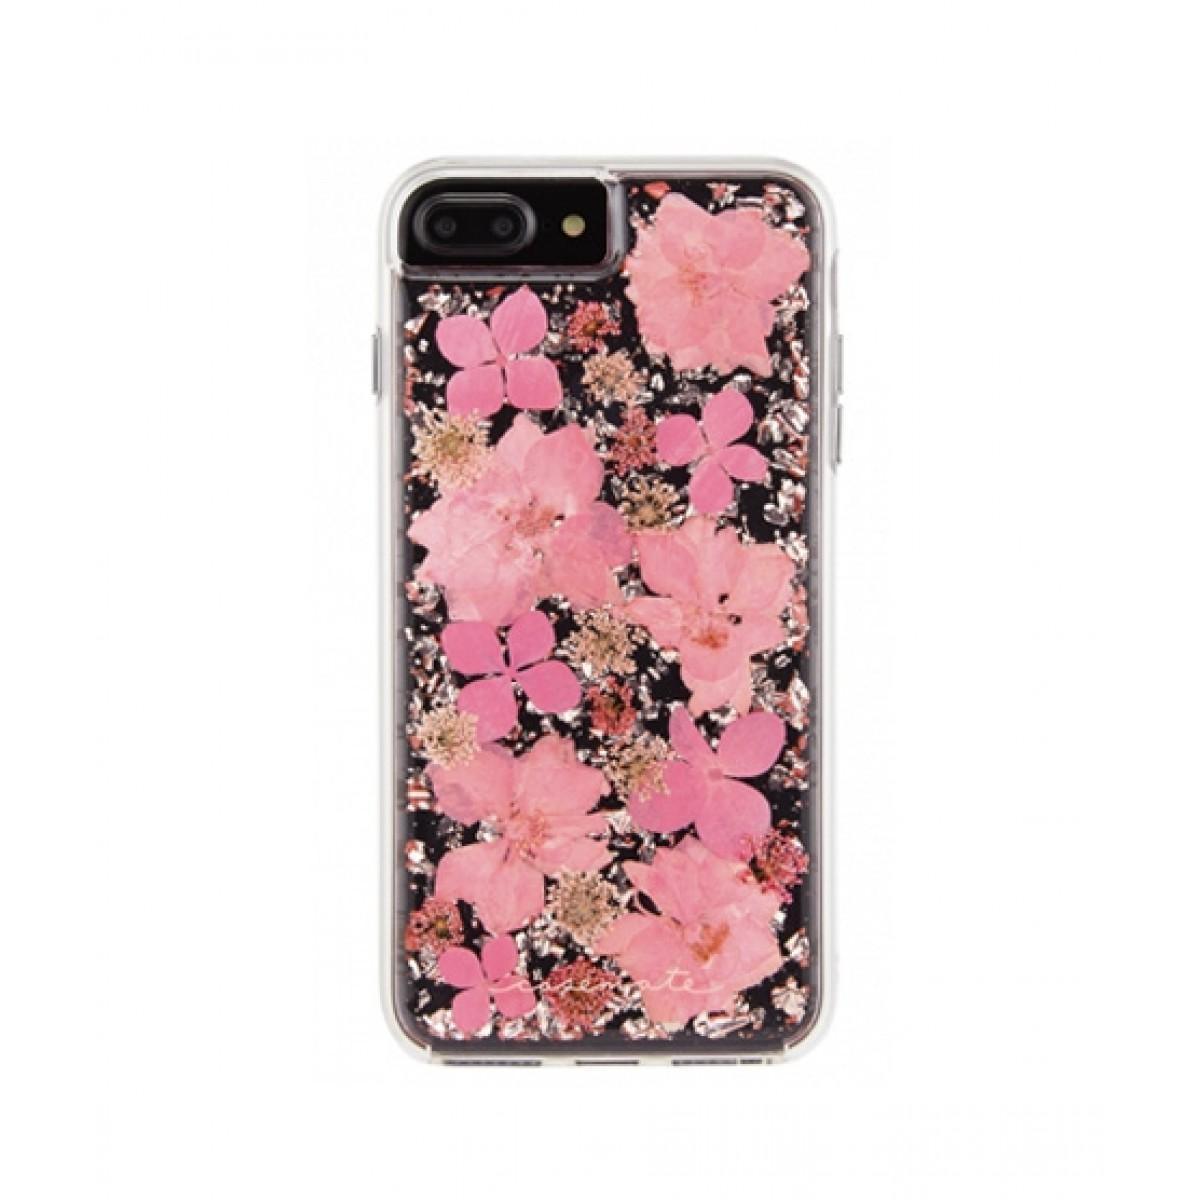 newest collection a0df2 5291b Case Mate Karat Petals Pink Case For iPhone 8 Plus